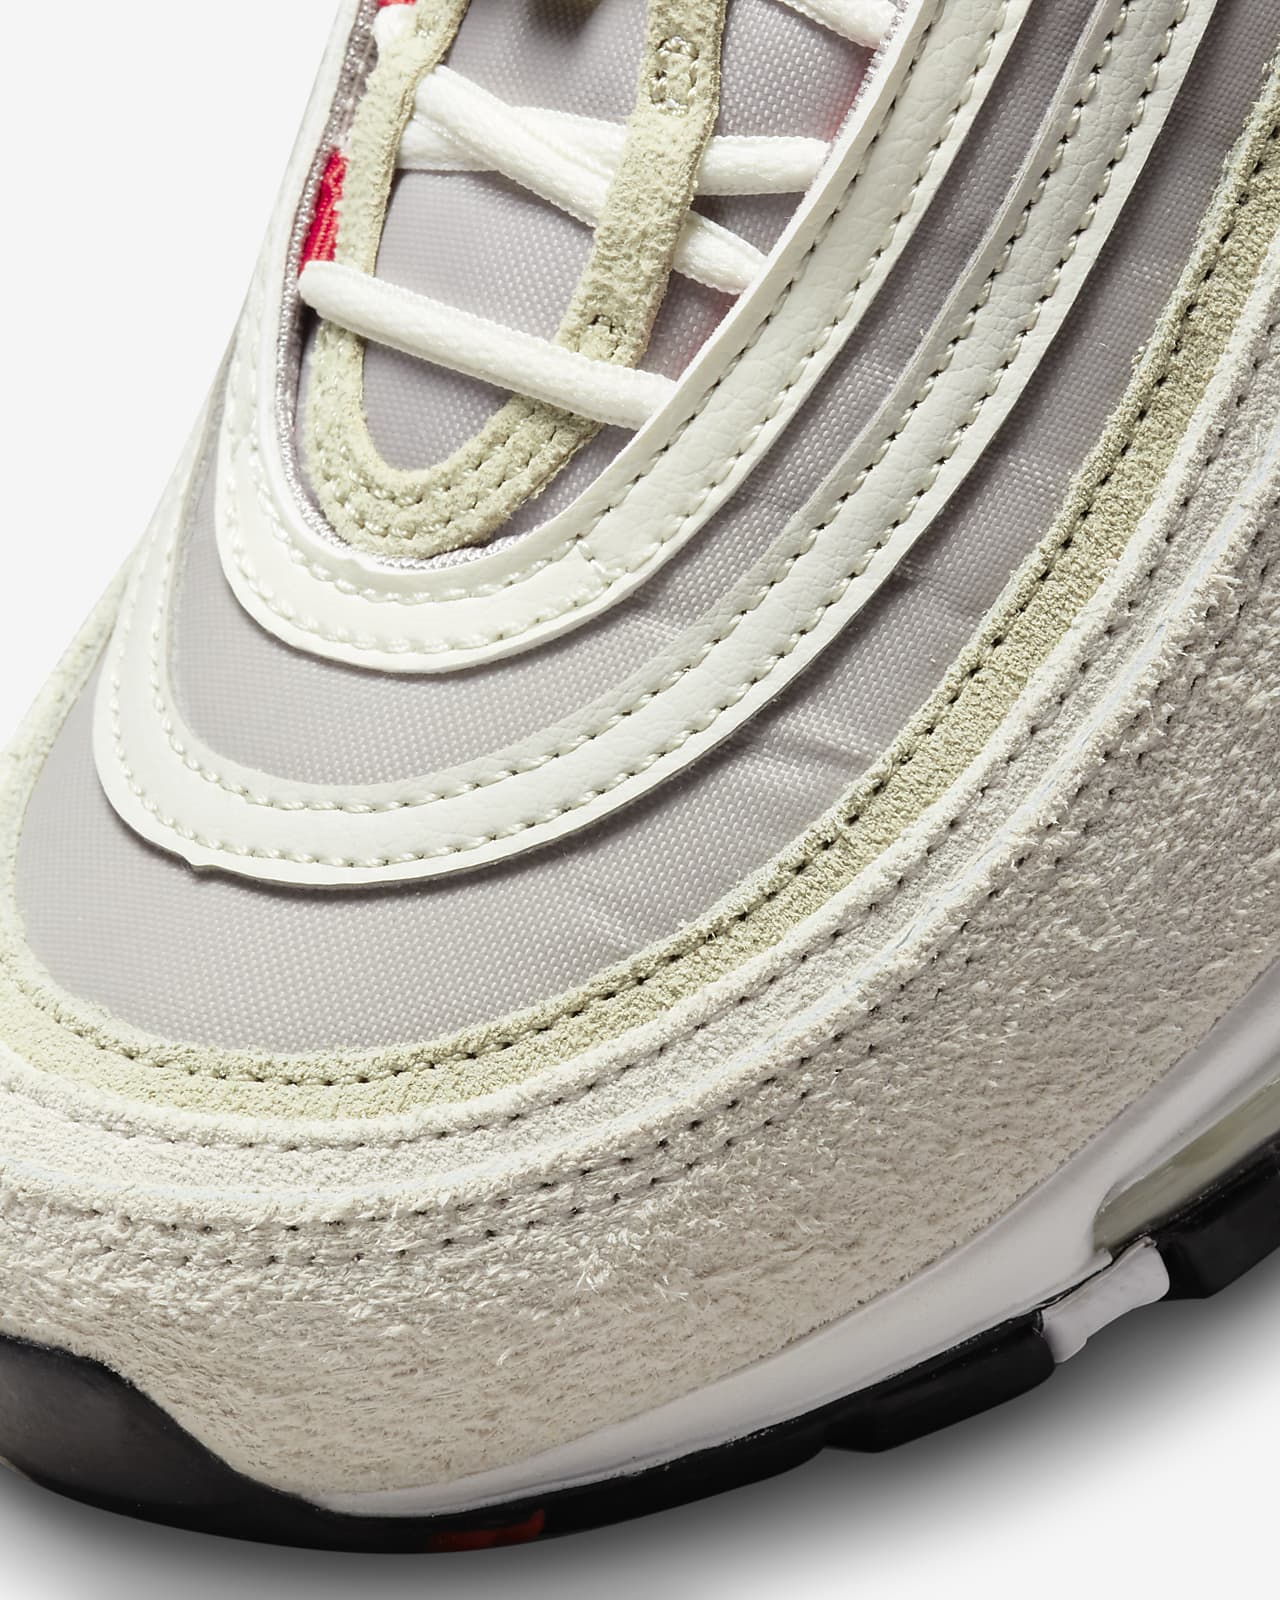 Chaussure Nike Air Max 97 SE pour Homme. Nike LU